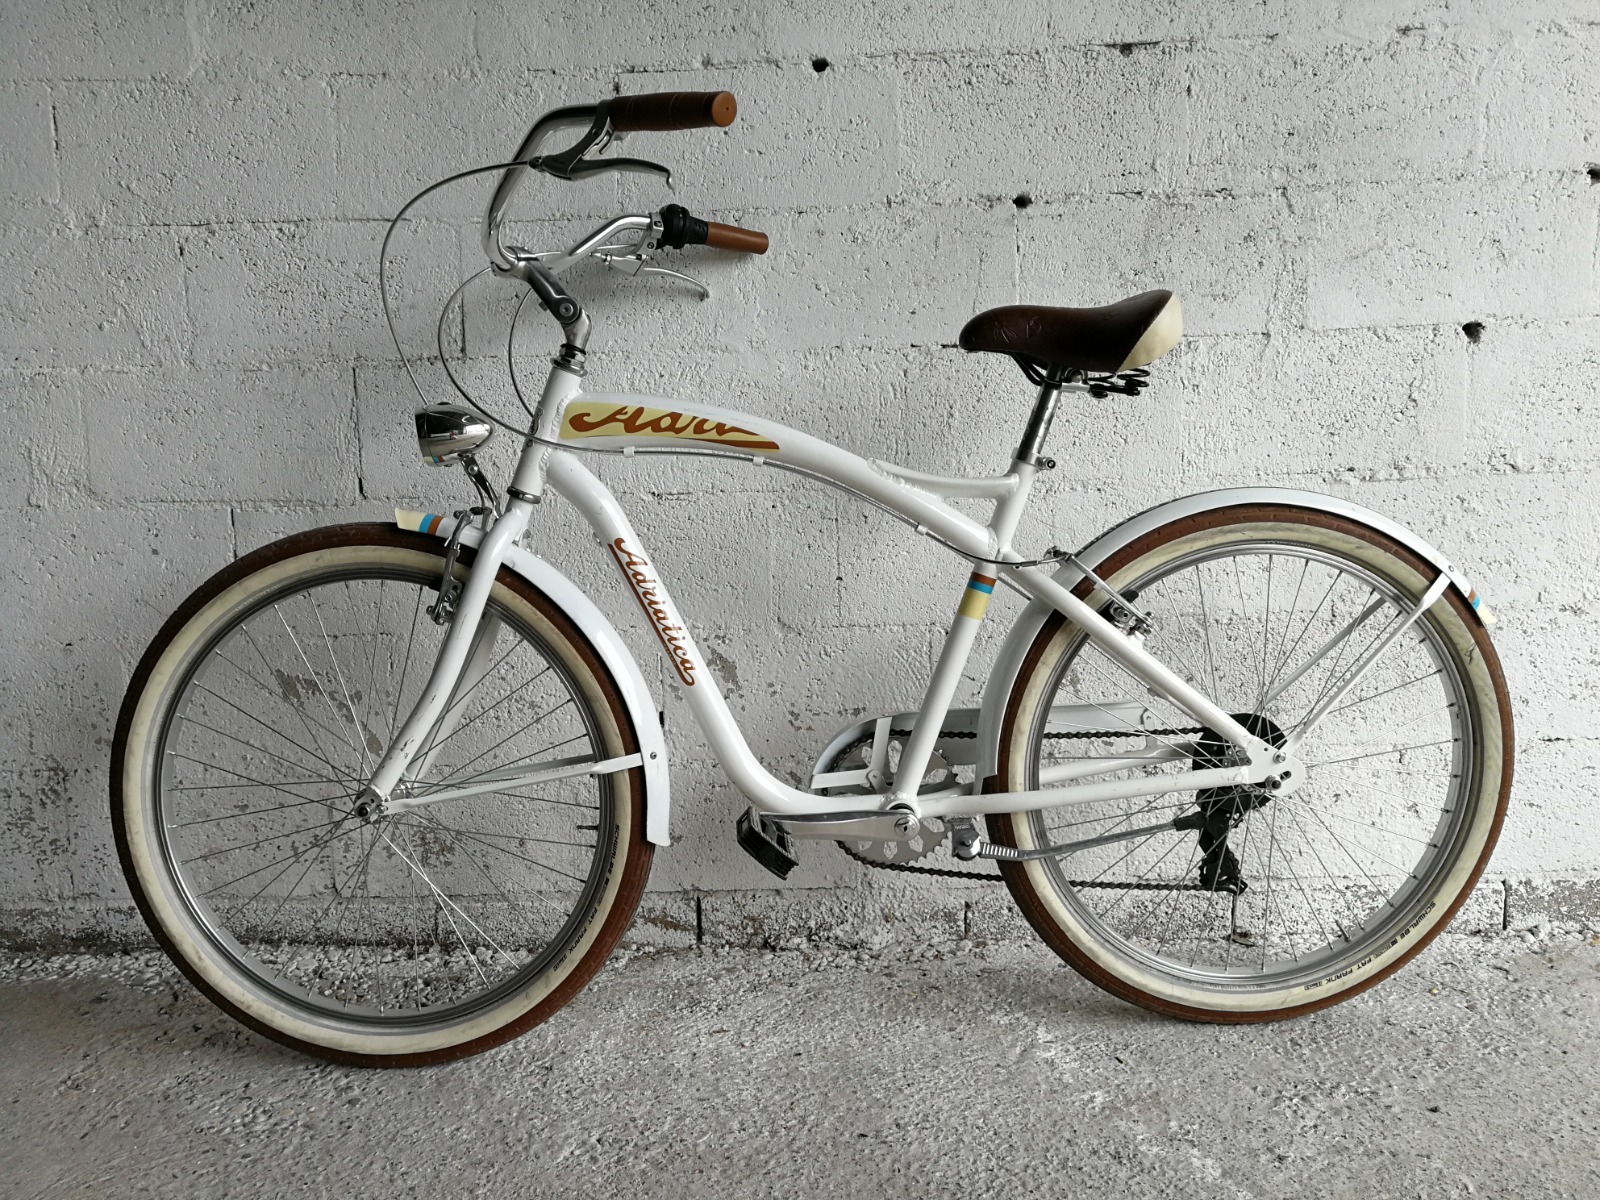 CRUISER CITY BIKE ADRIATICA - Noleggio bici Mantova